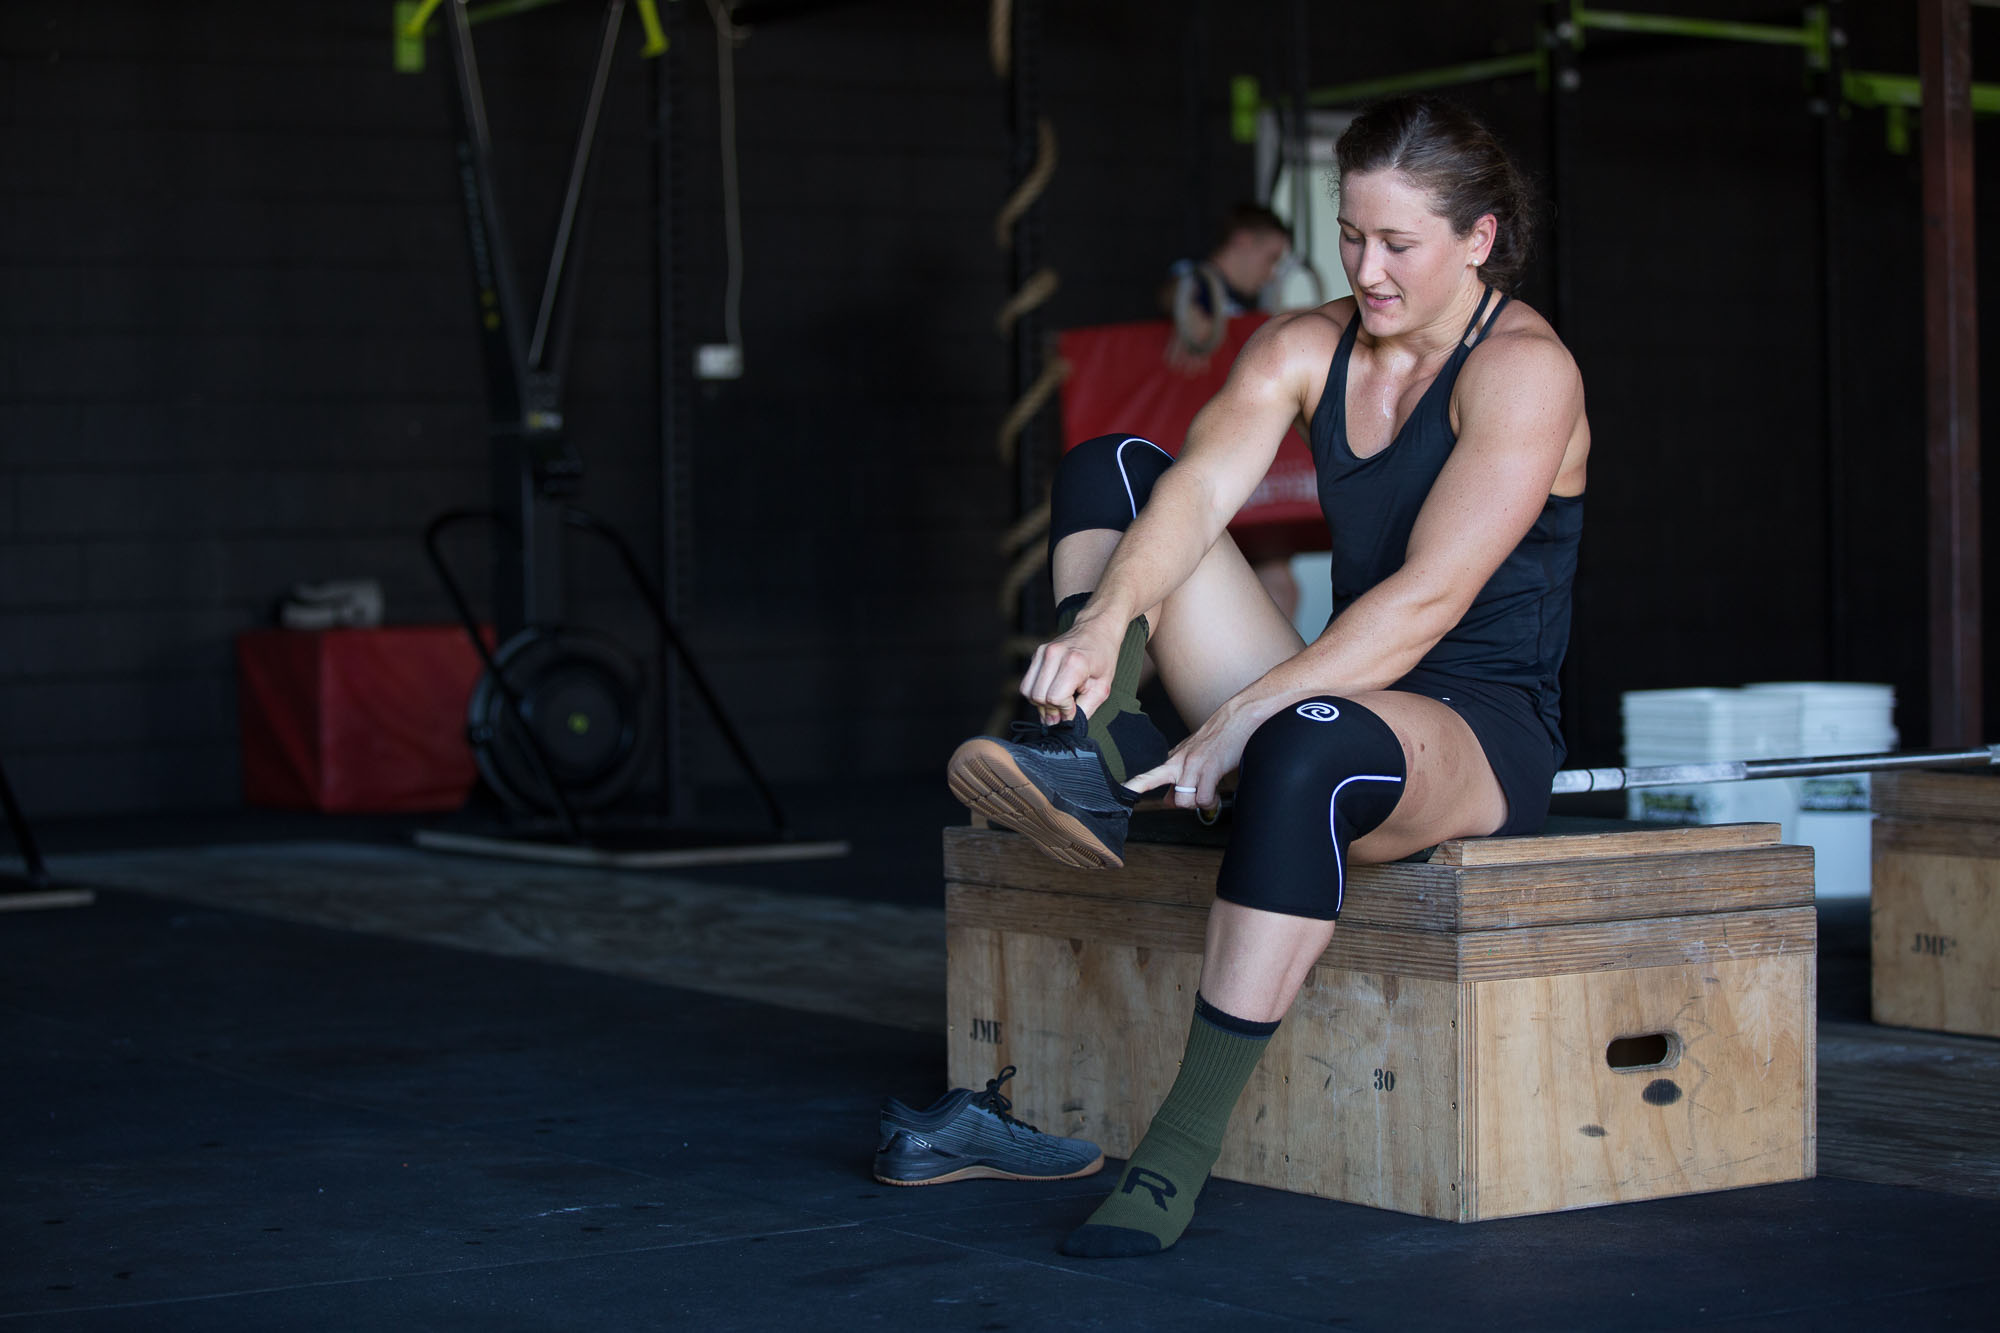 Rencontre avec l'ambassadrice Rehband Tia-Clair Toomey – Championne des CrossFit Games® 2018